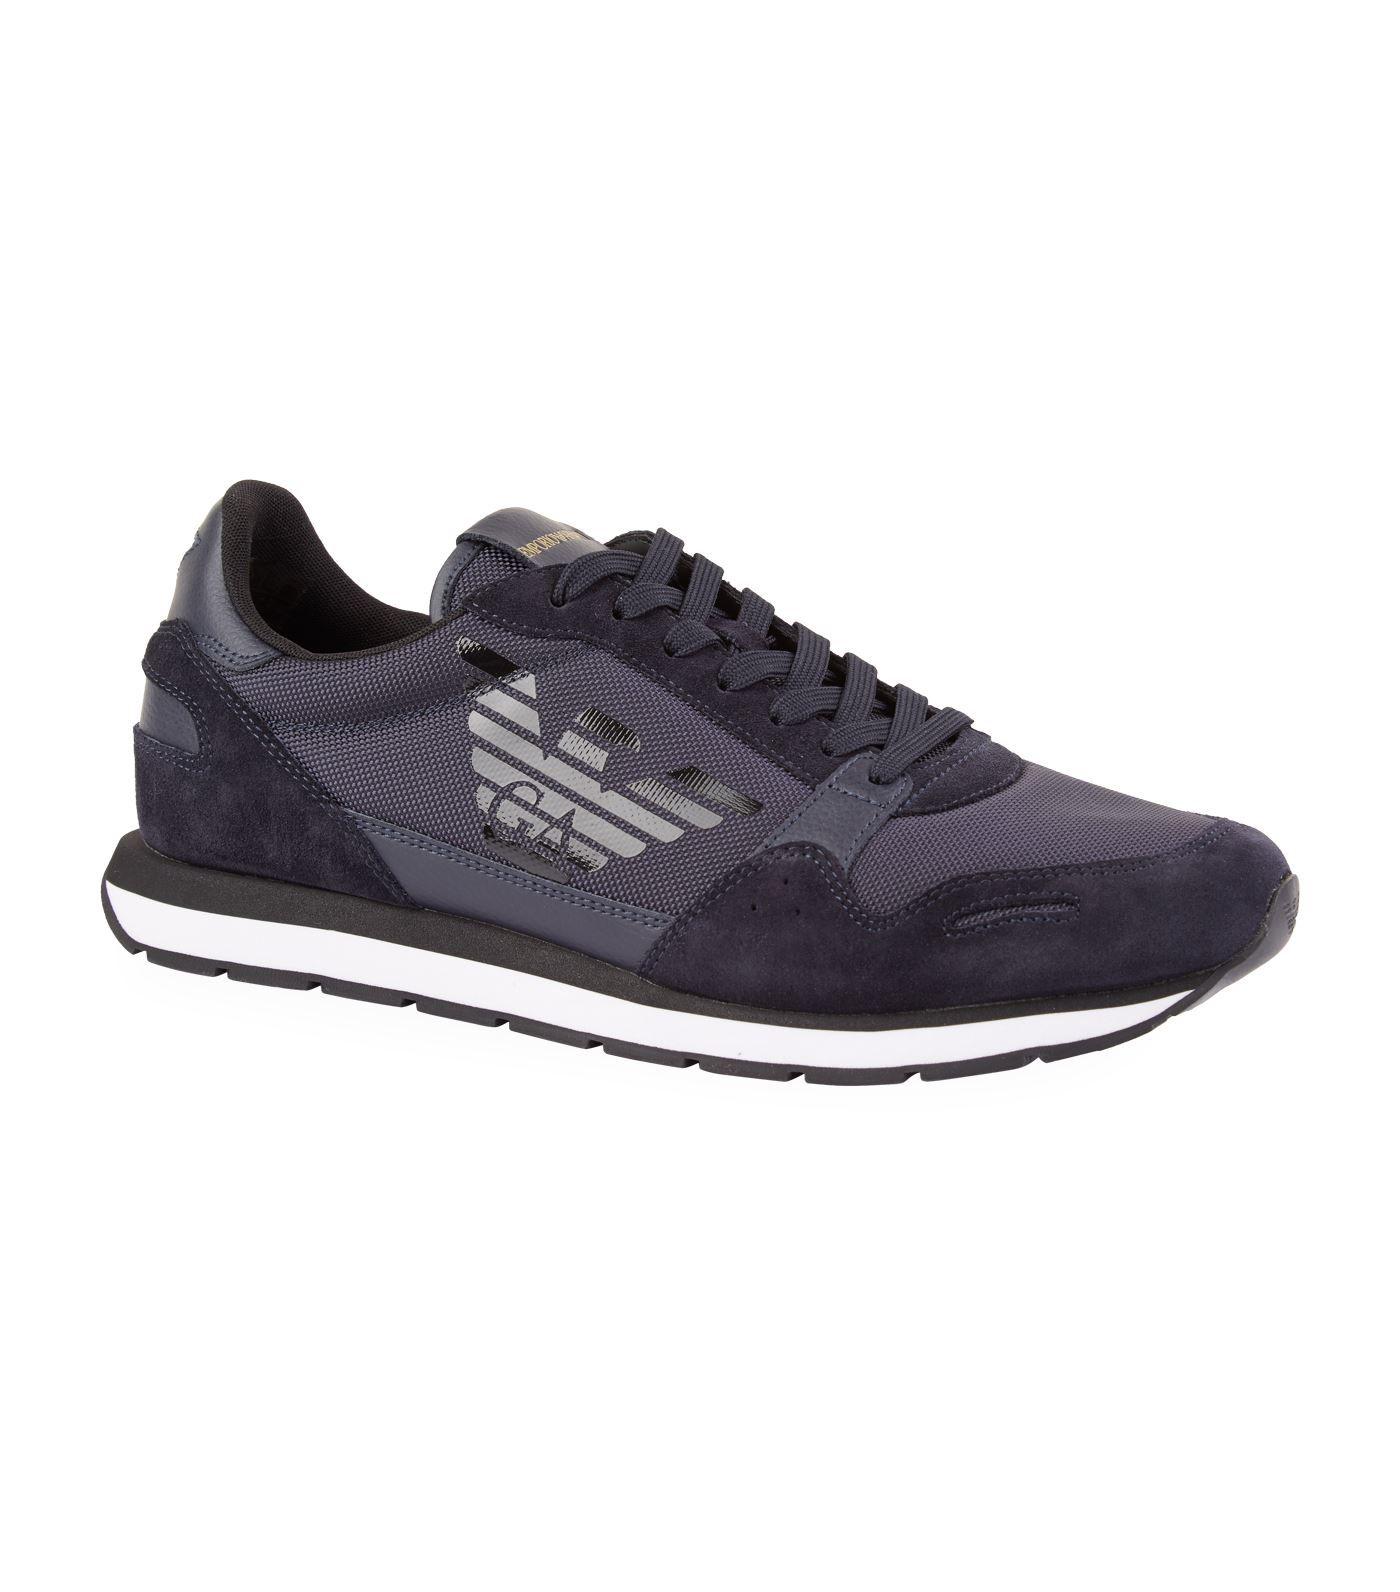 3937eb78305 Emporio Armani Suede Trim Eagle Mesh Sneakers #AD , #SPONSORED, #Suede,